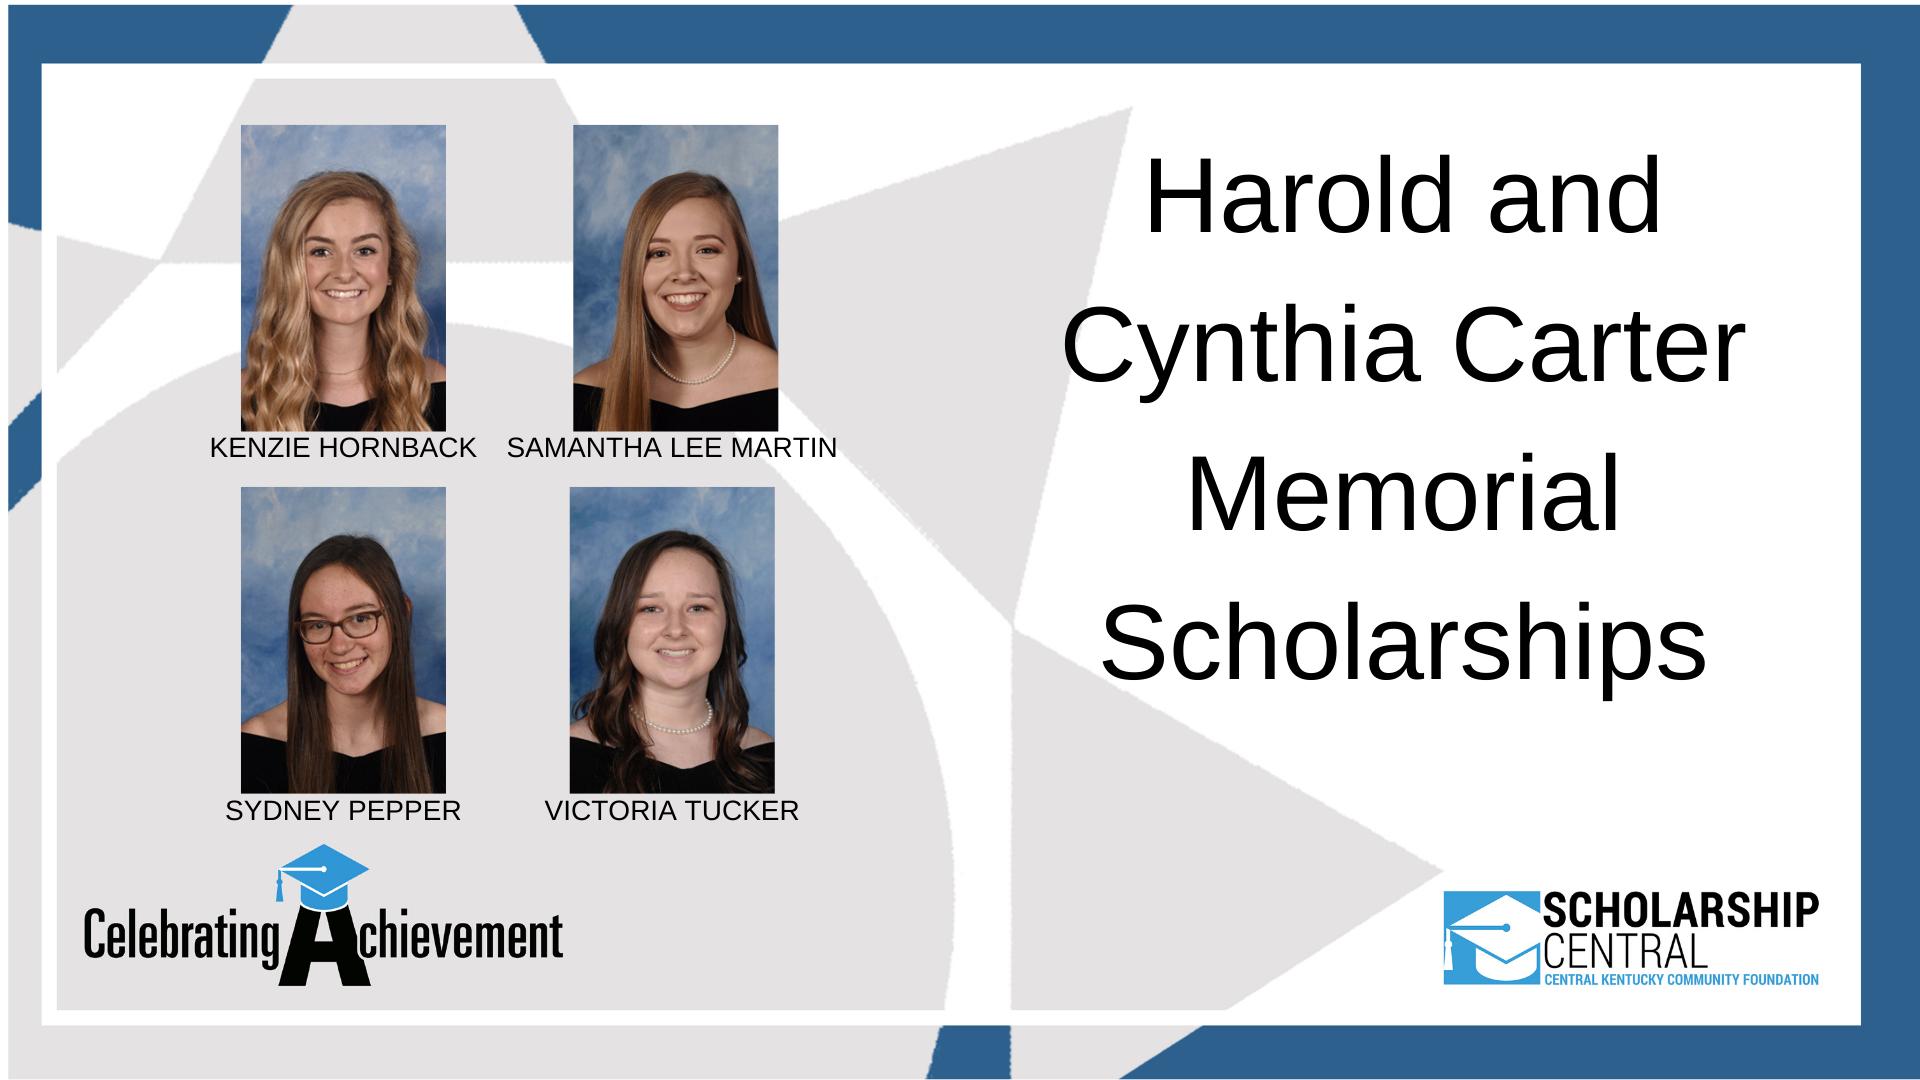 Harold and Cynthia Carter Scholarship2